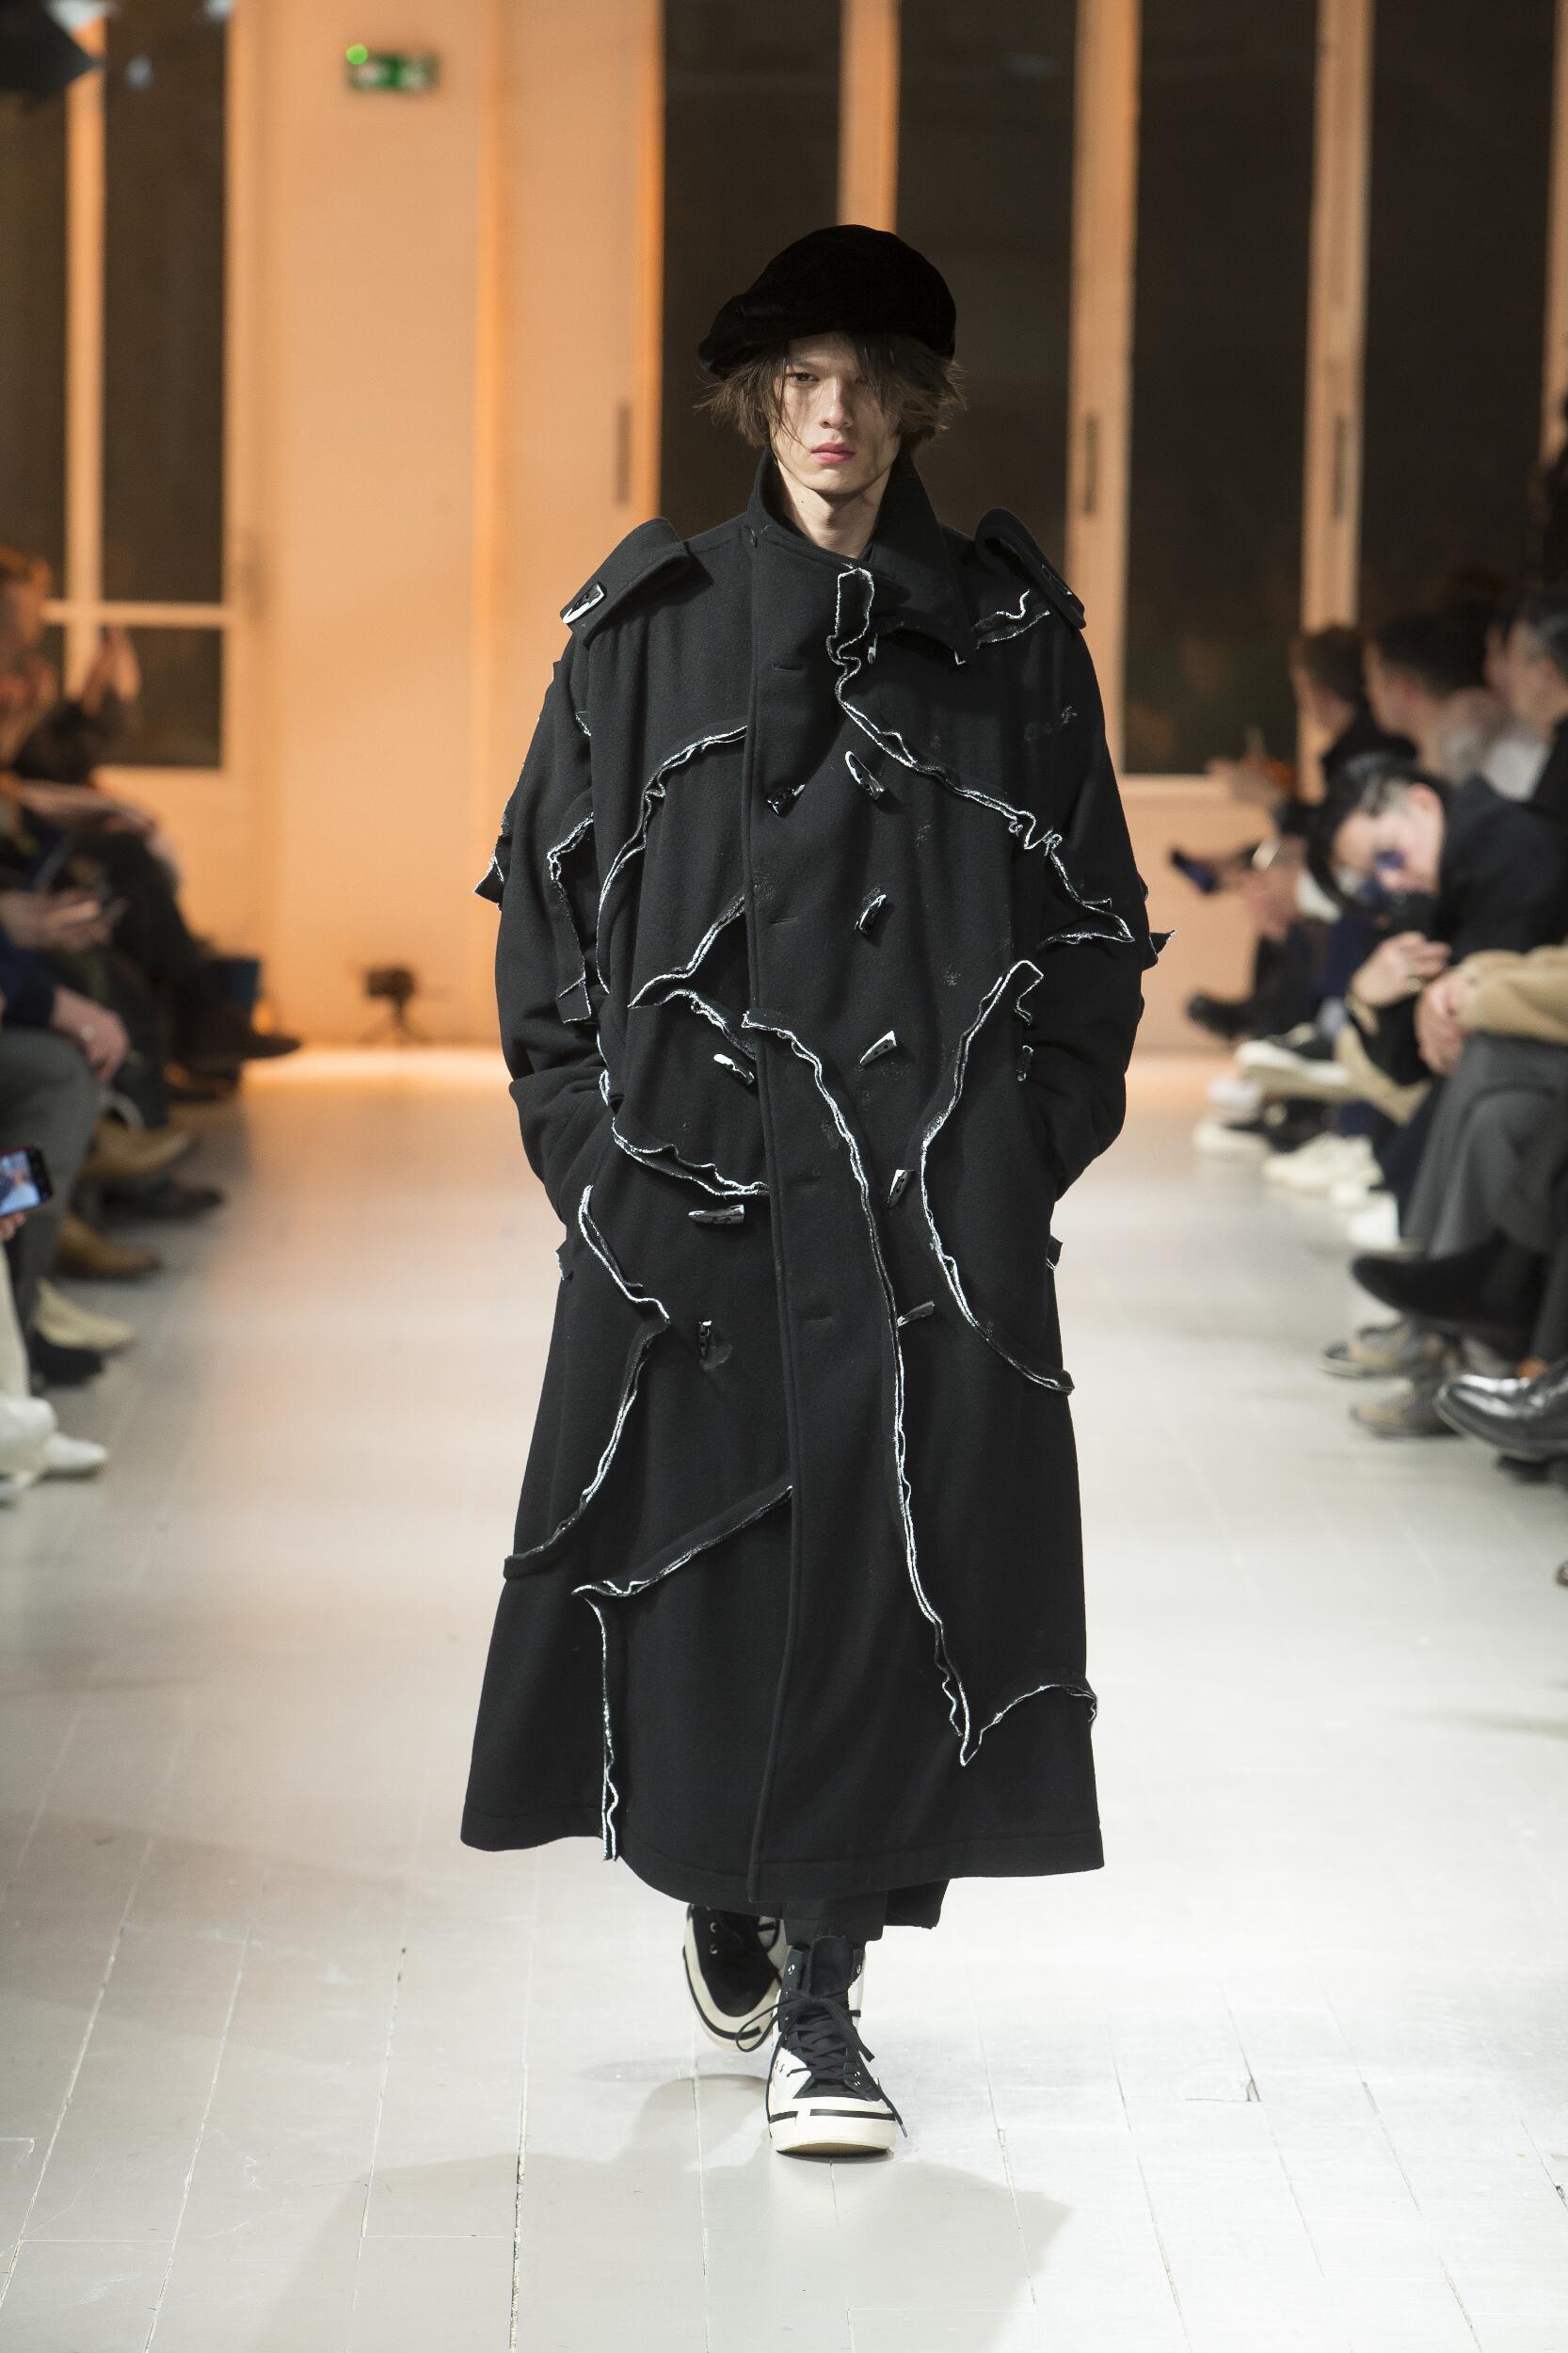 Catwalk Yohji Yamamoto Men Fashion Show Winter 2020